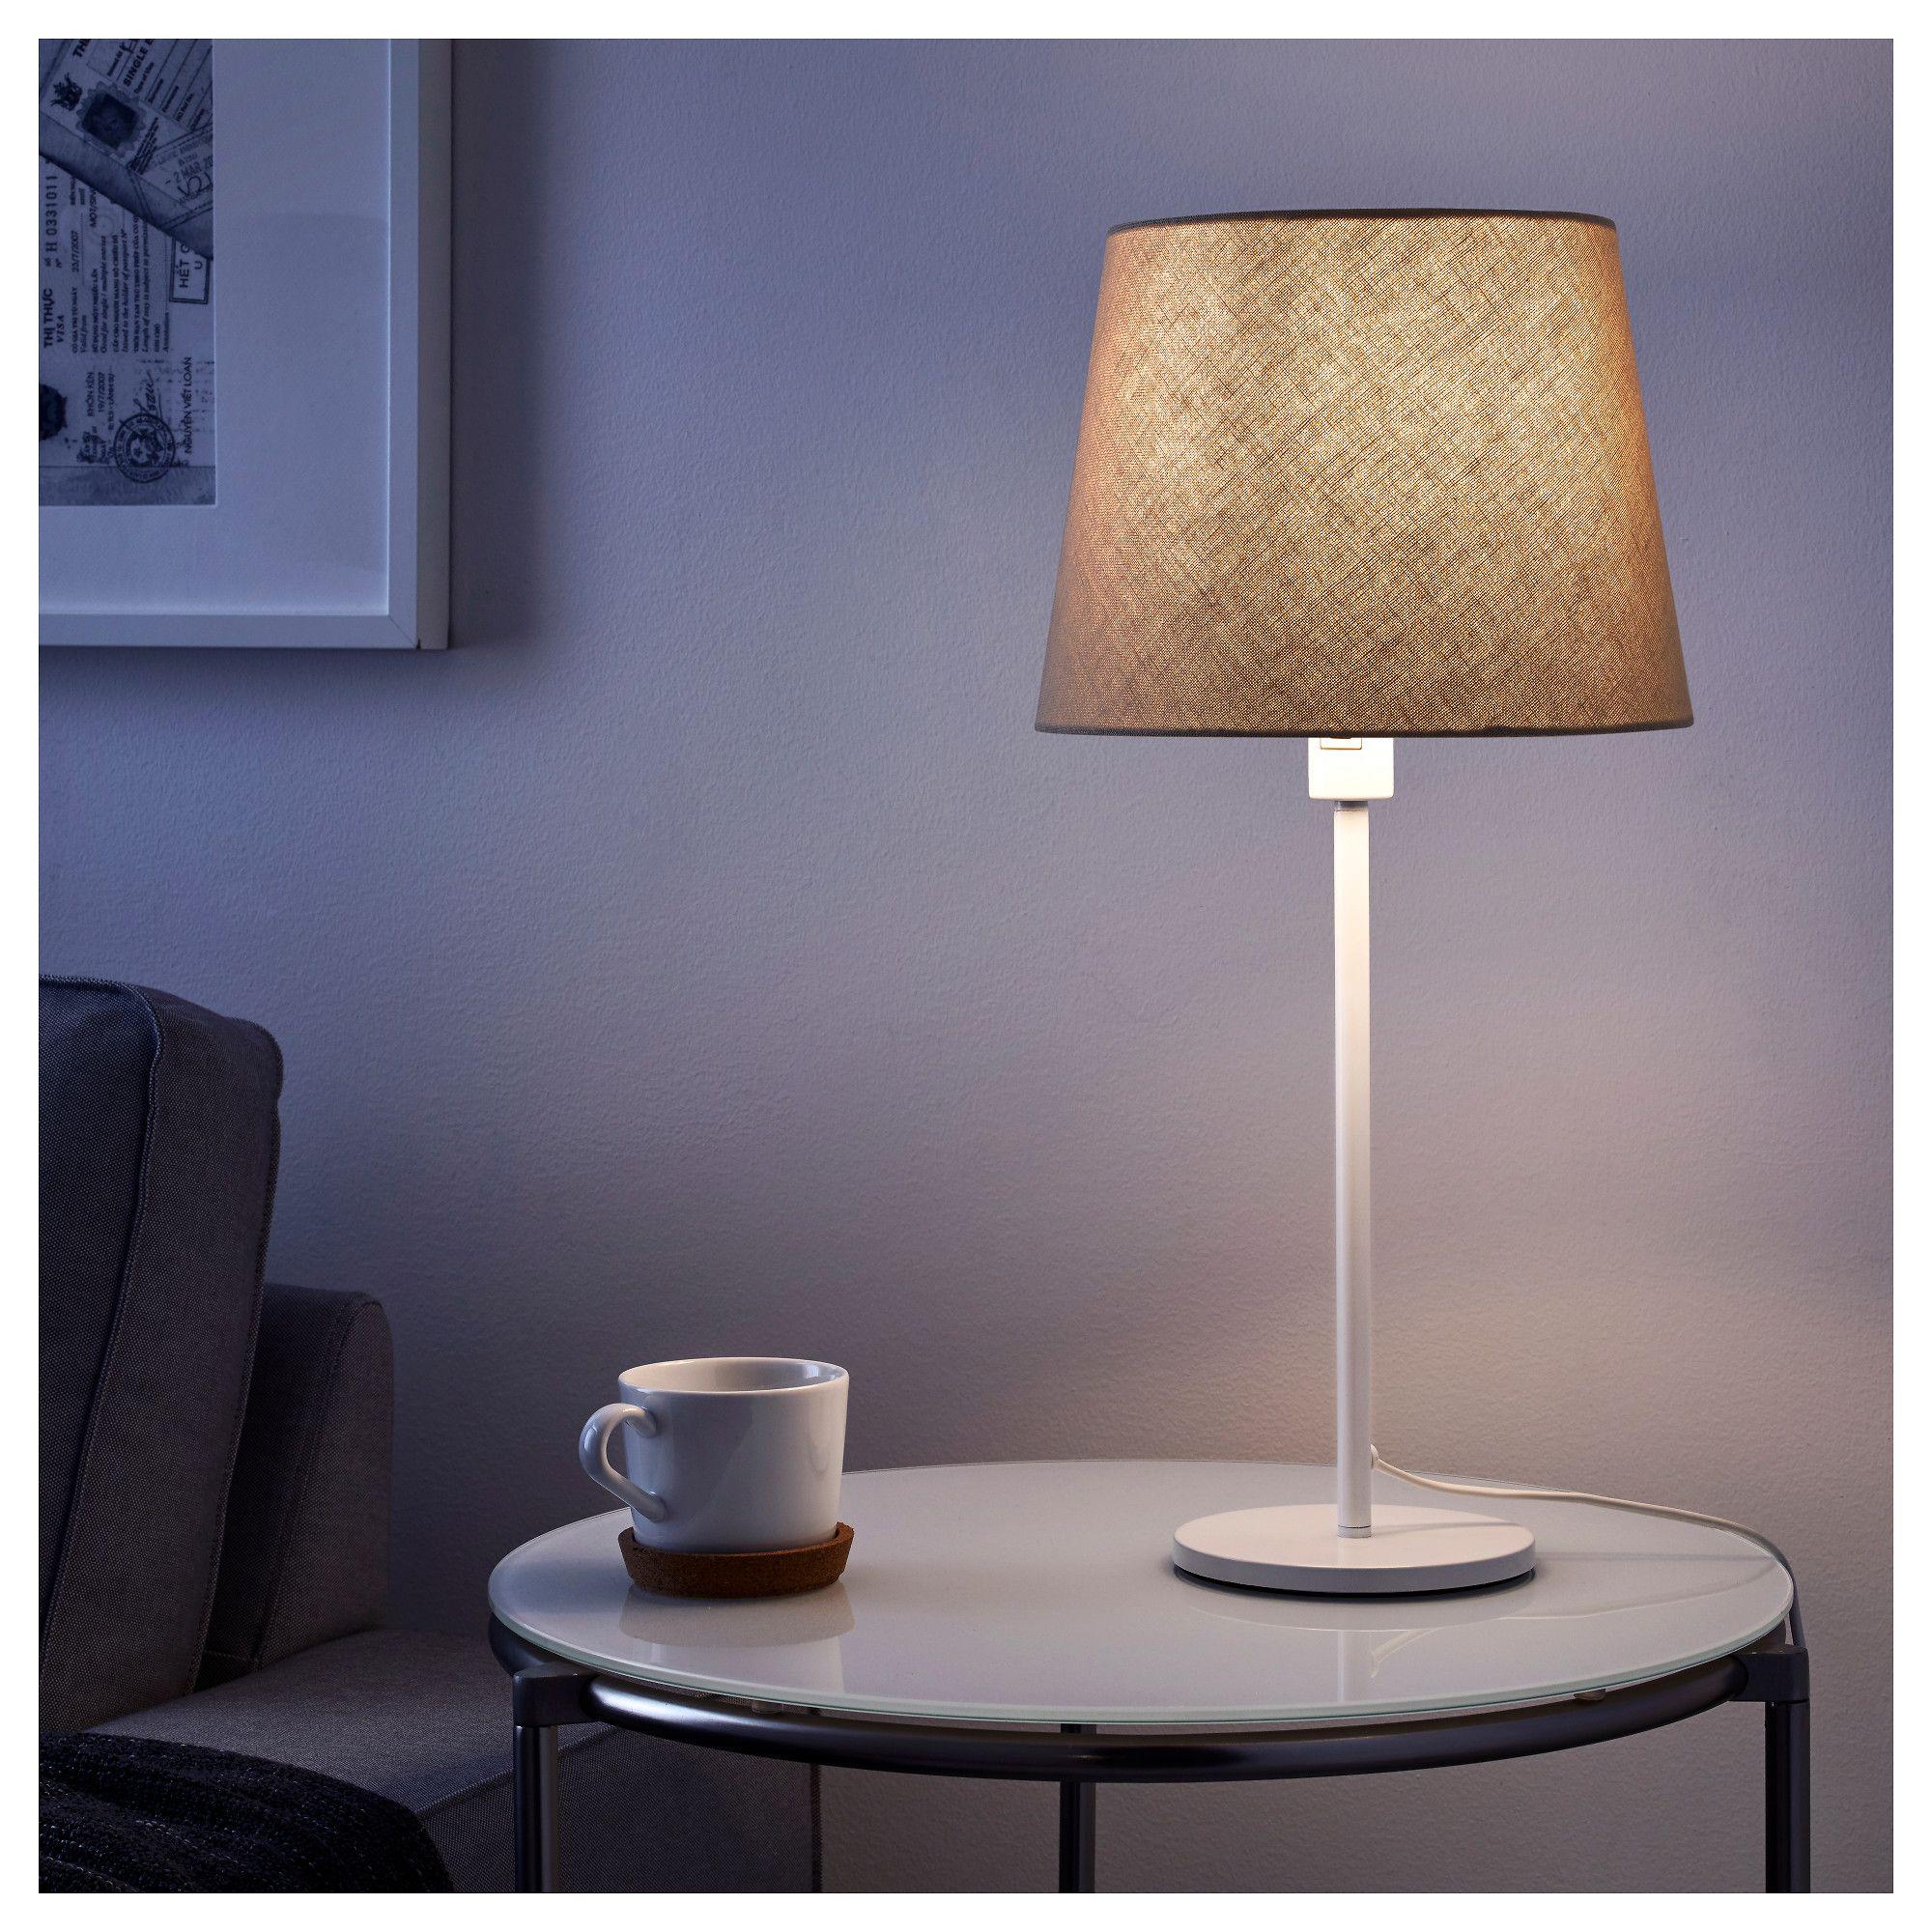 Dimbare Led Lamp Ikea.Ikea Jara Lampen